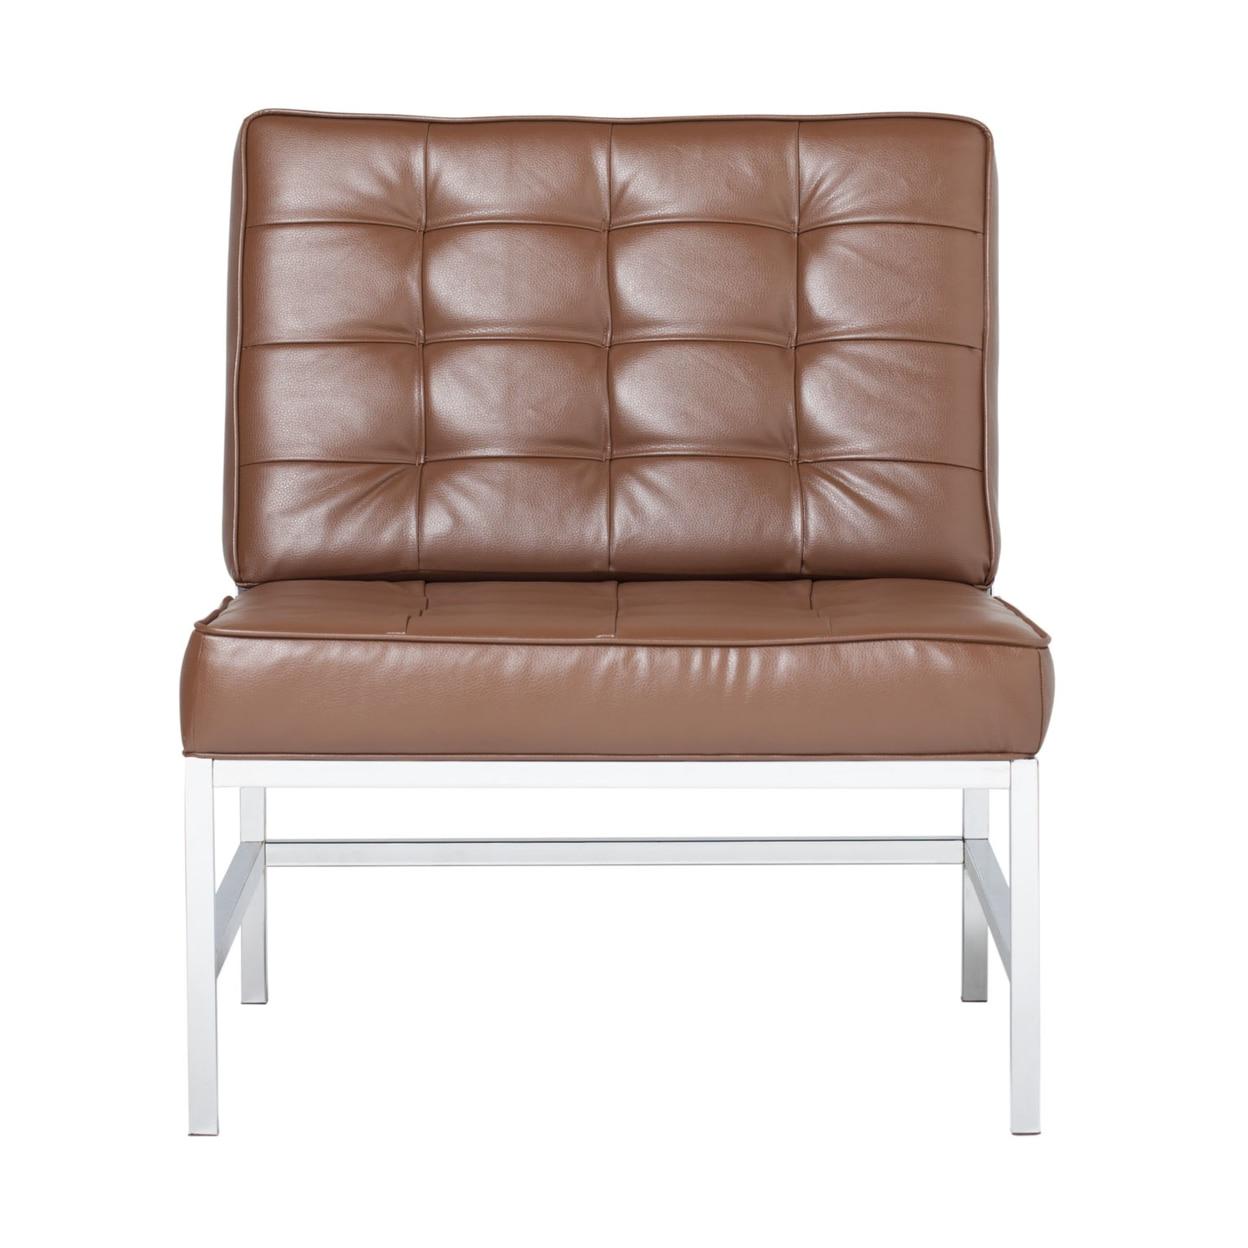 Offex Home Office Ashlar Chair - Walnut